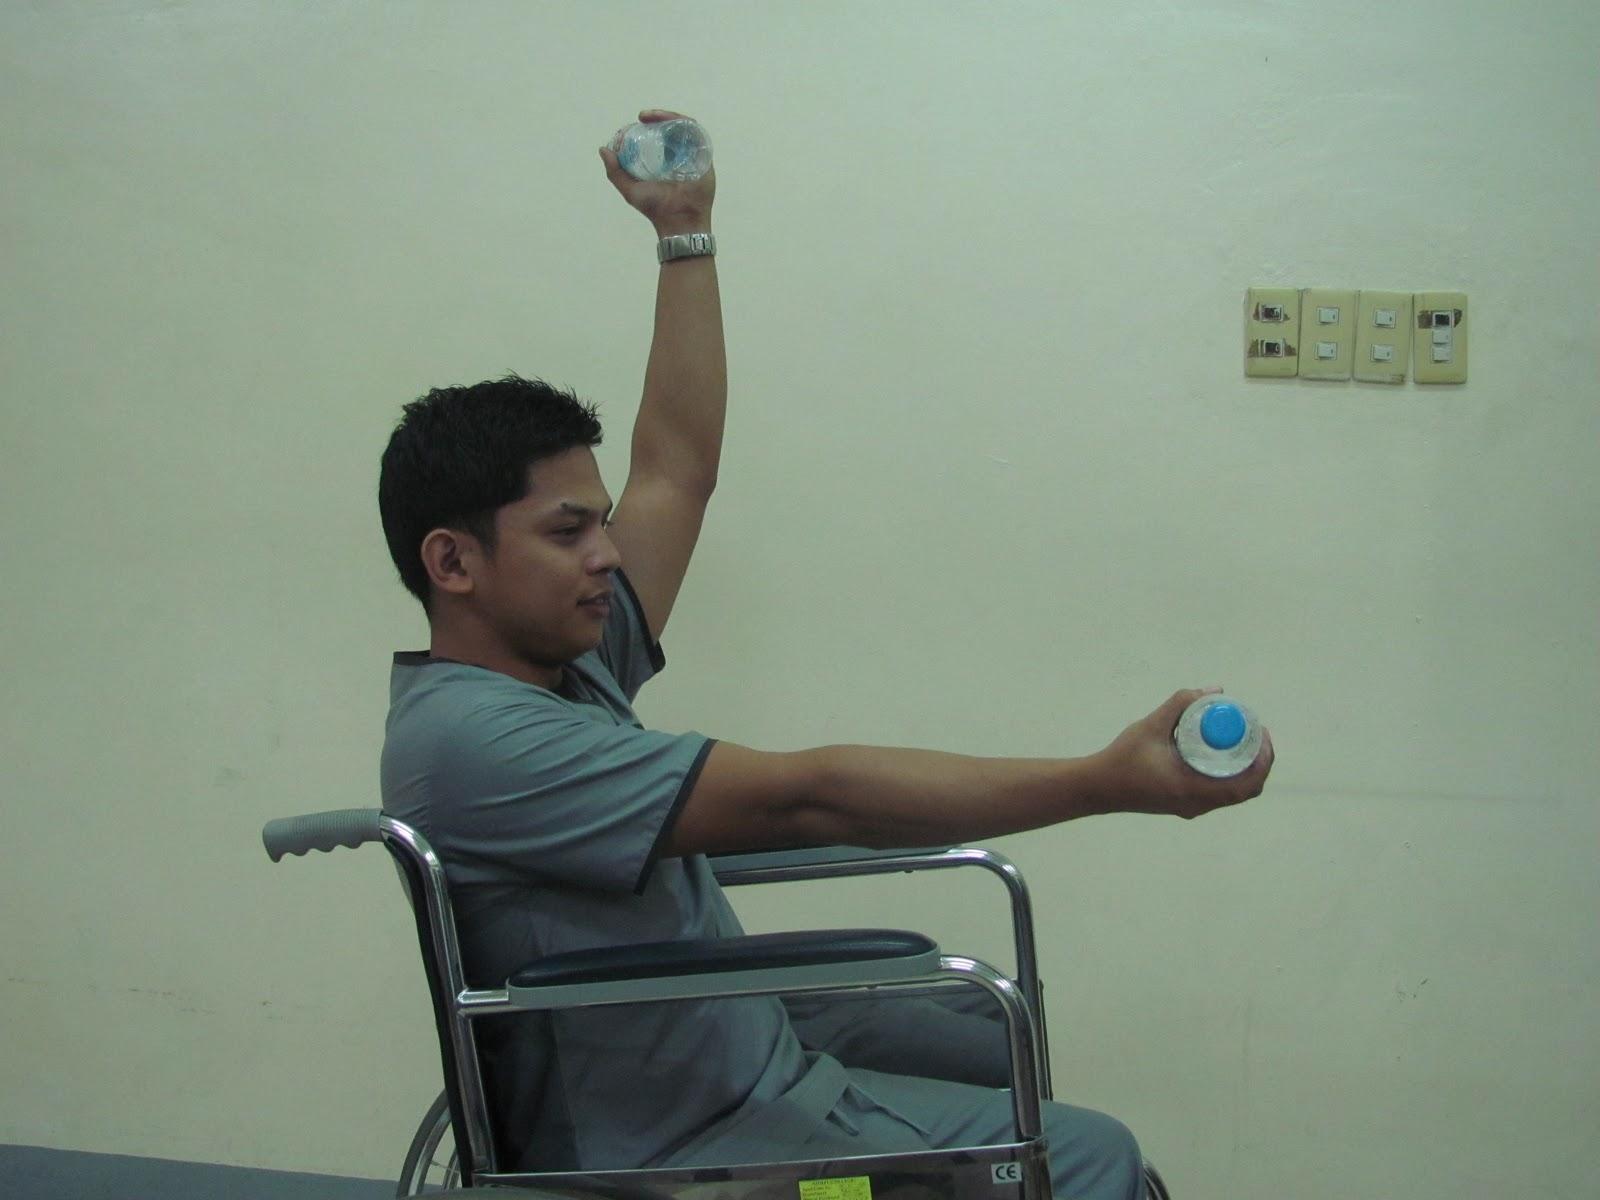 Arm Lifts Exercises : Your rehabilitation medicine